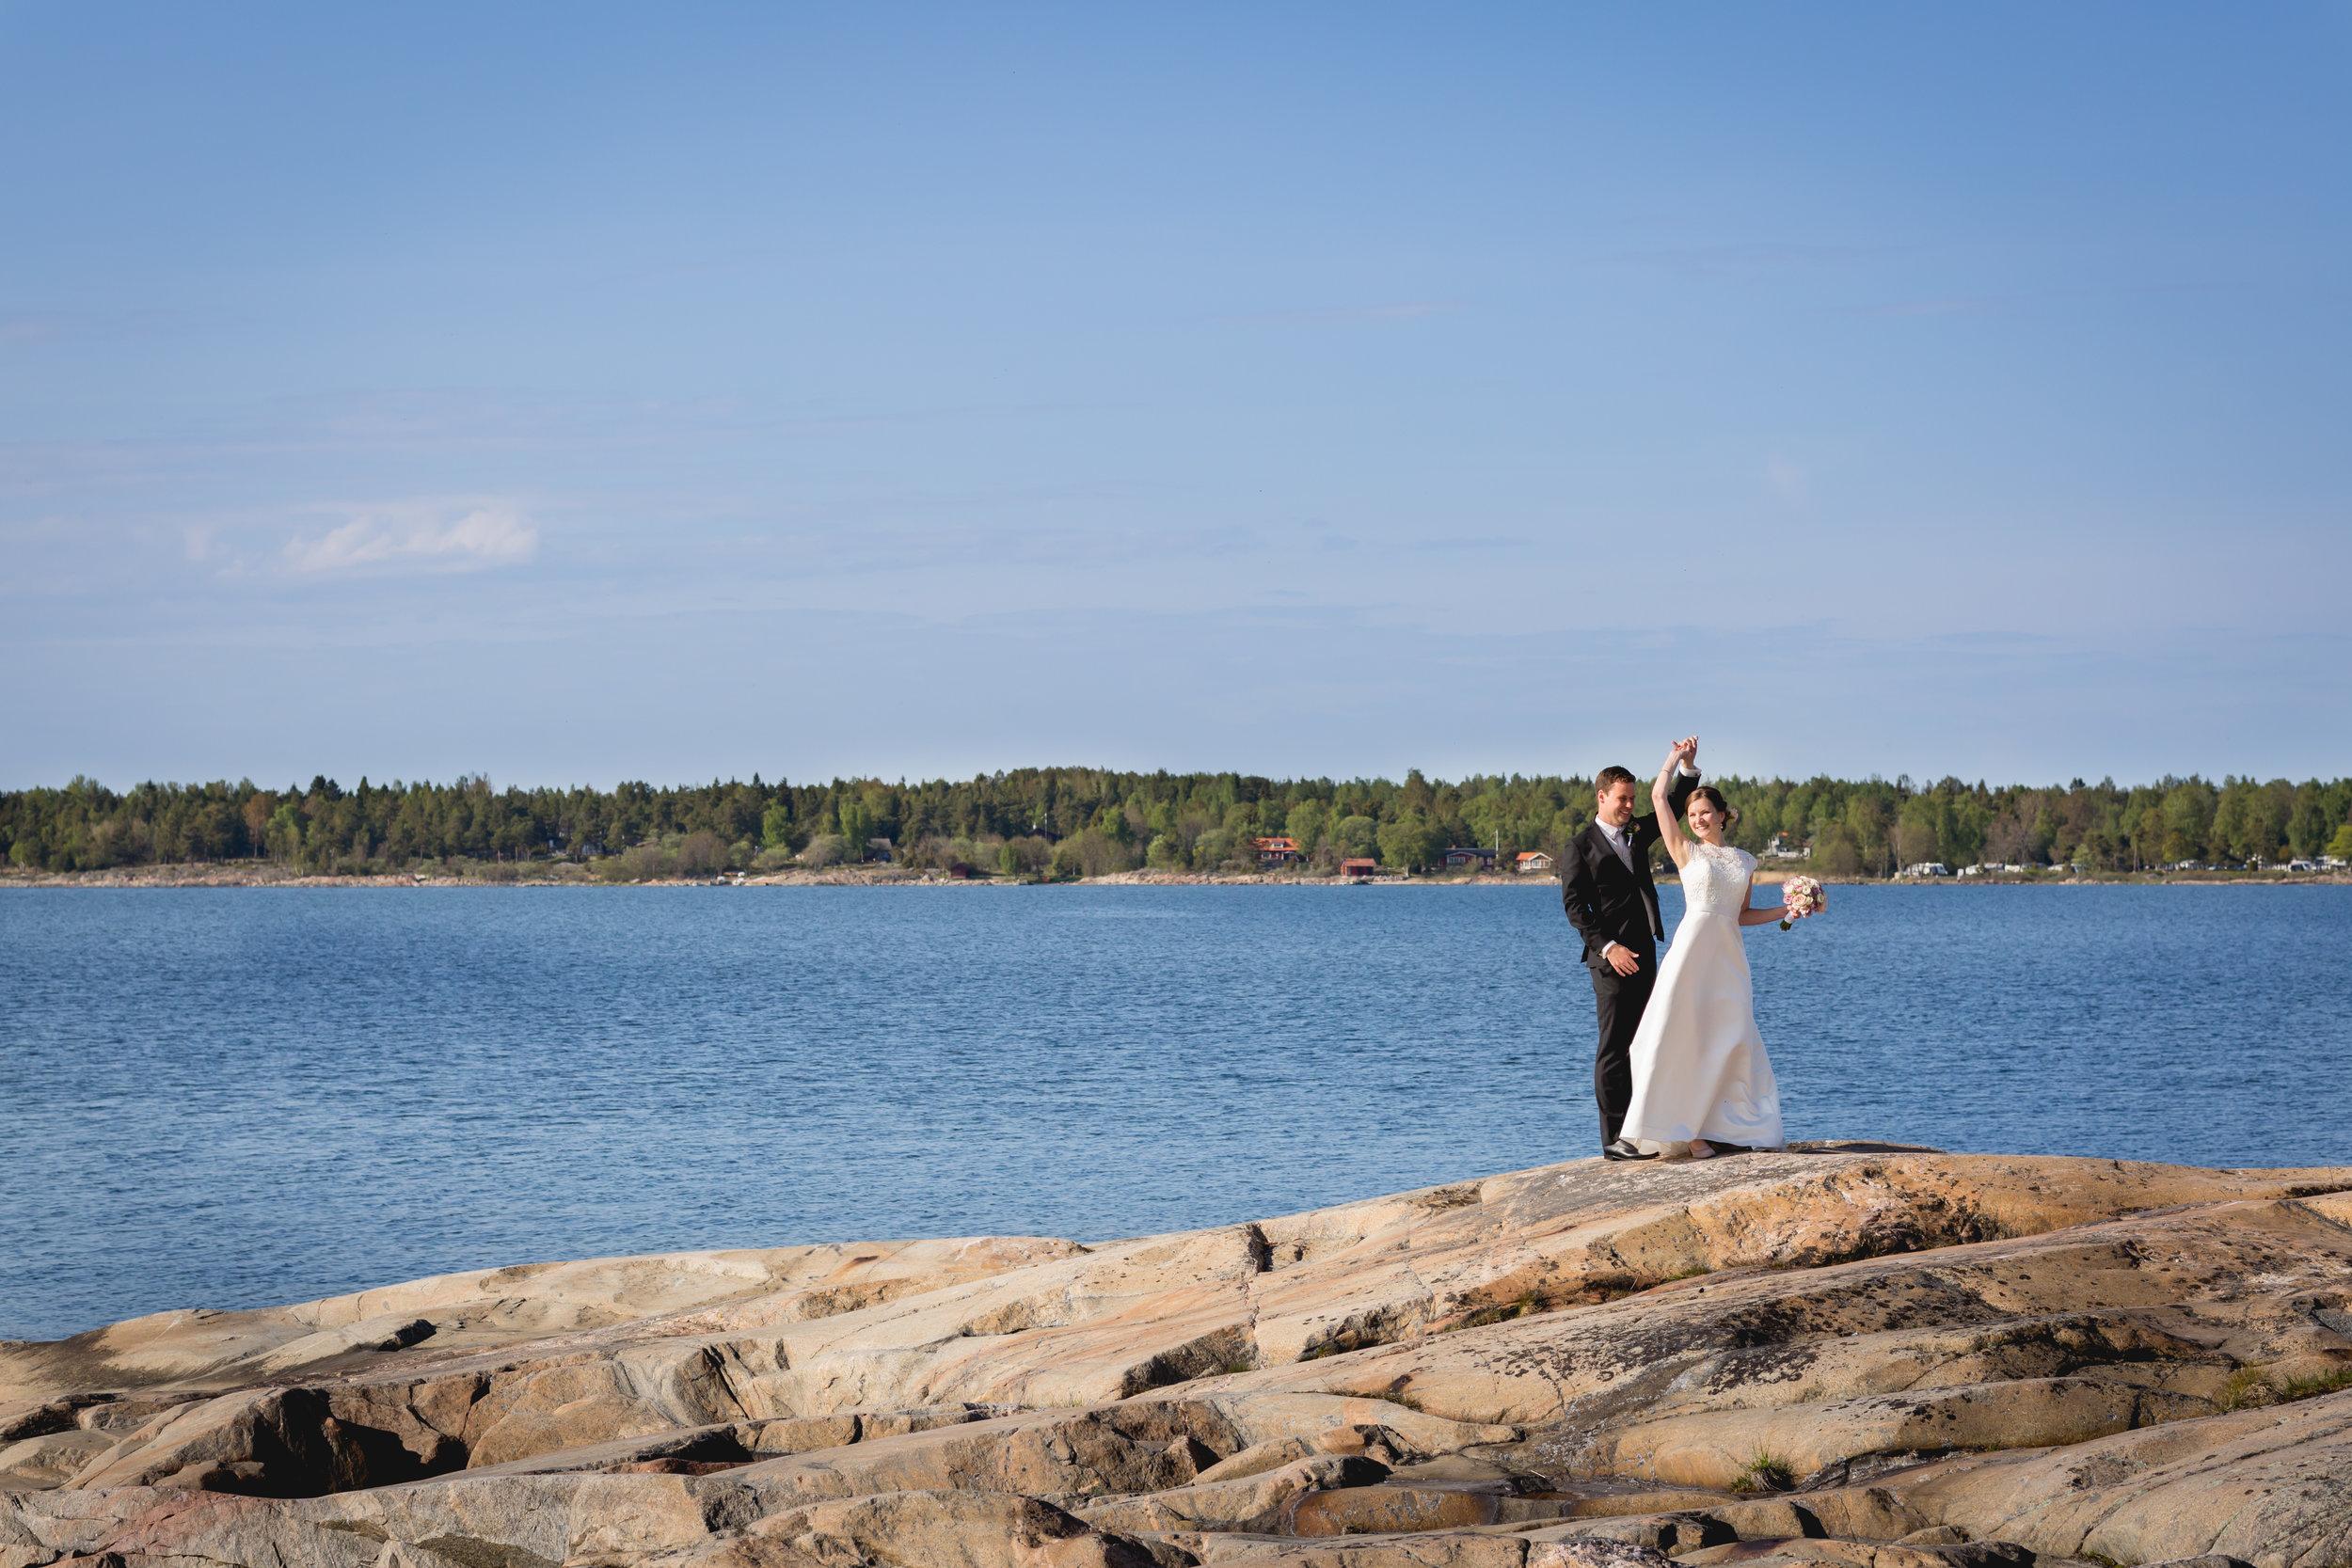 Wedding Photography by the Ocean - European Wedding Photographers